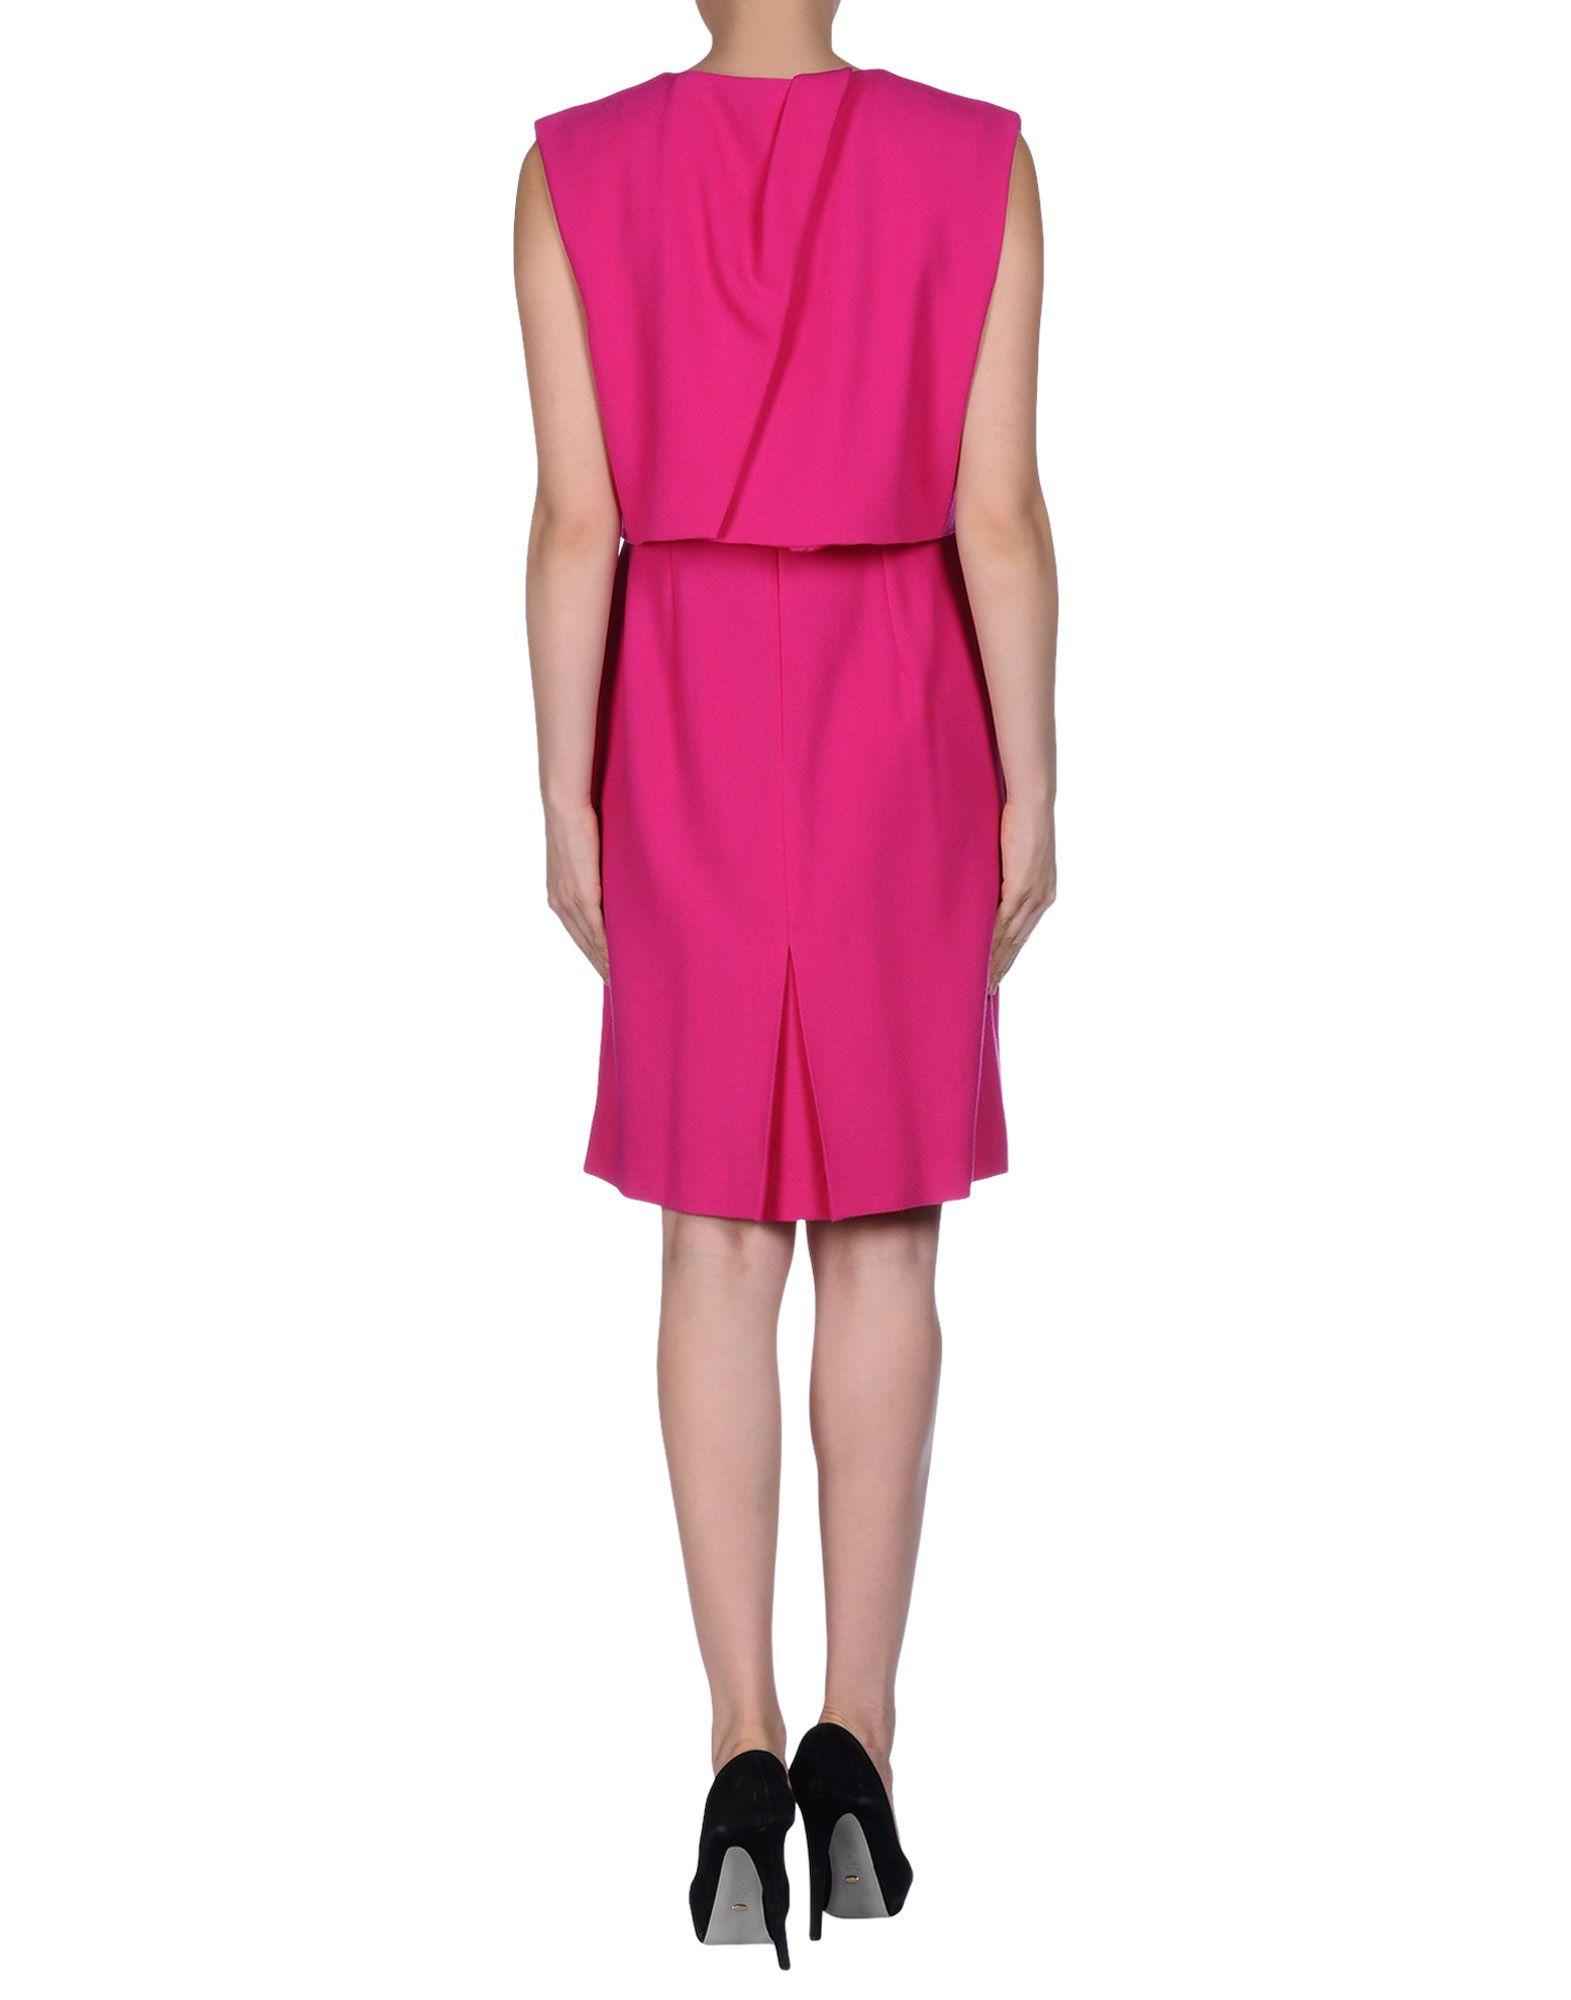 dior short dresses - photo #36